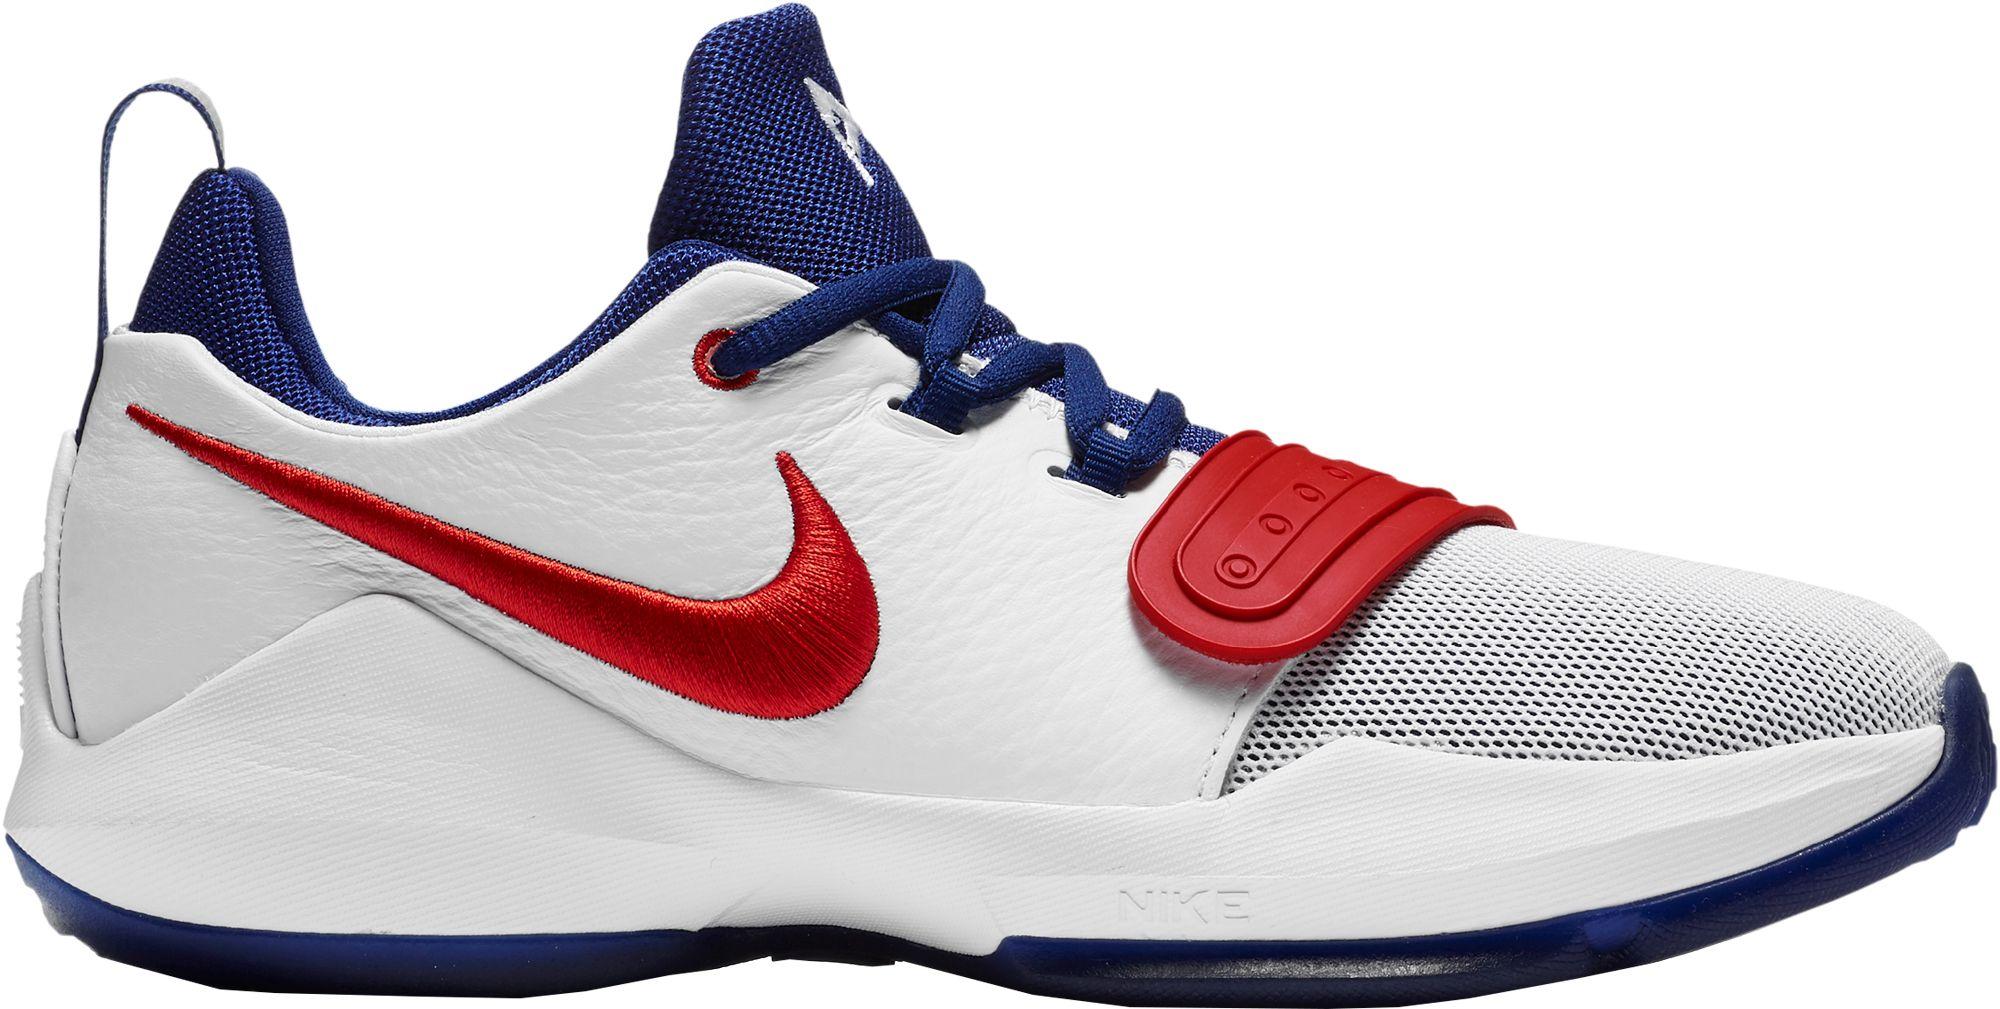 Nike Kids' Grade School PG 1 Basketball Shoes DICK'S Sporting Goods